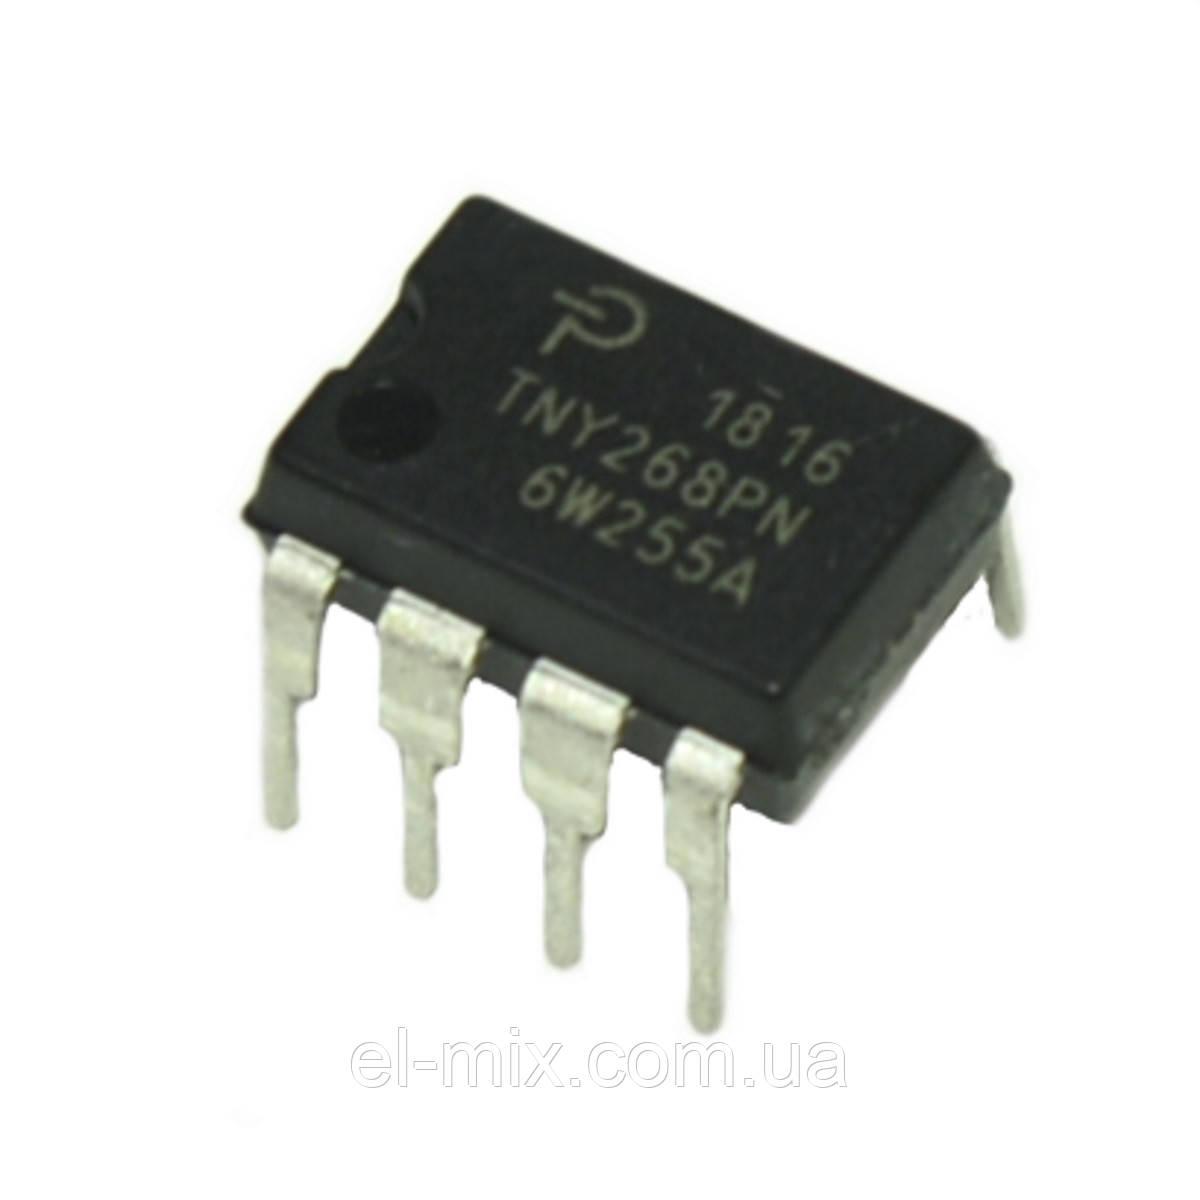 Микросхема TNY268PN  dip7  PI/China